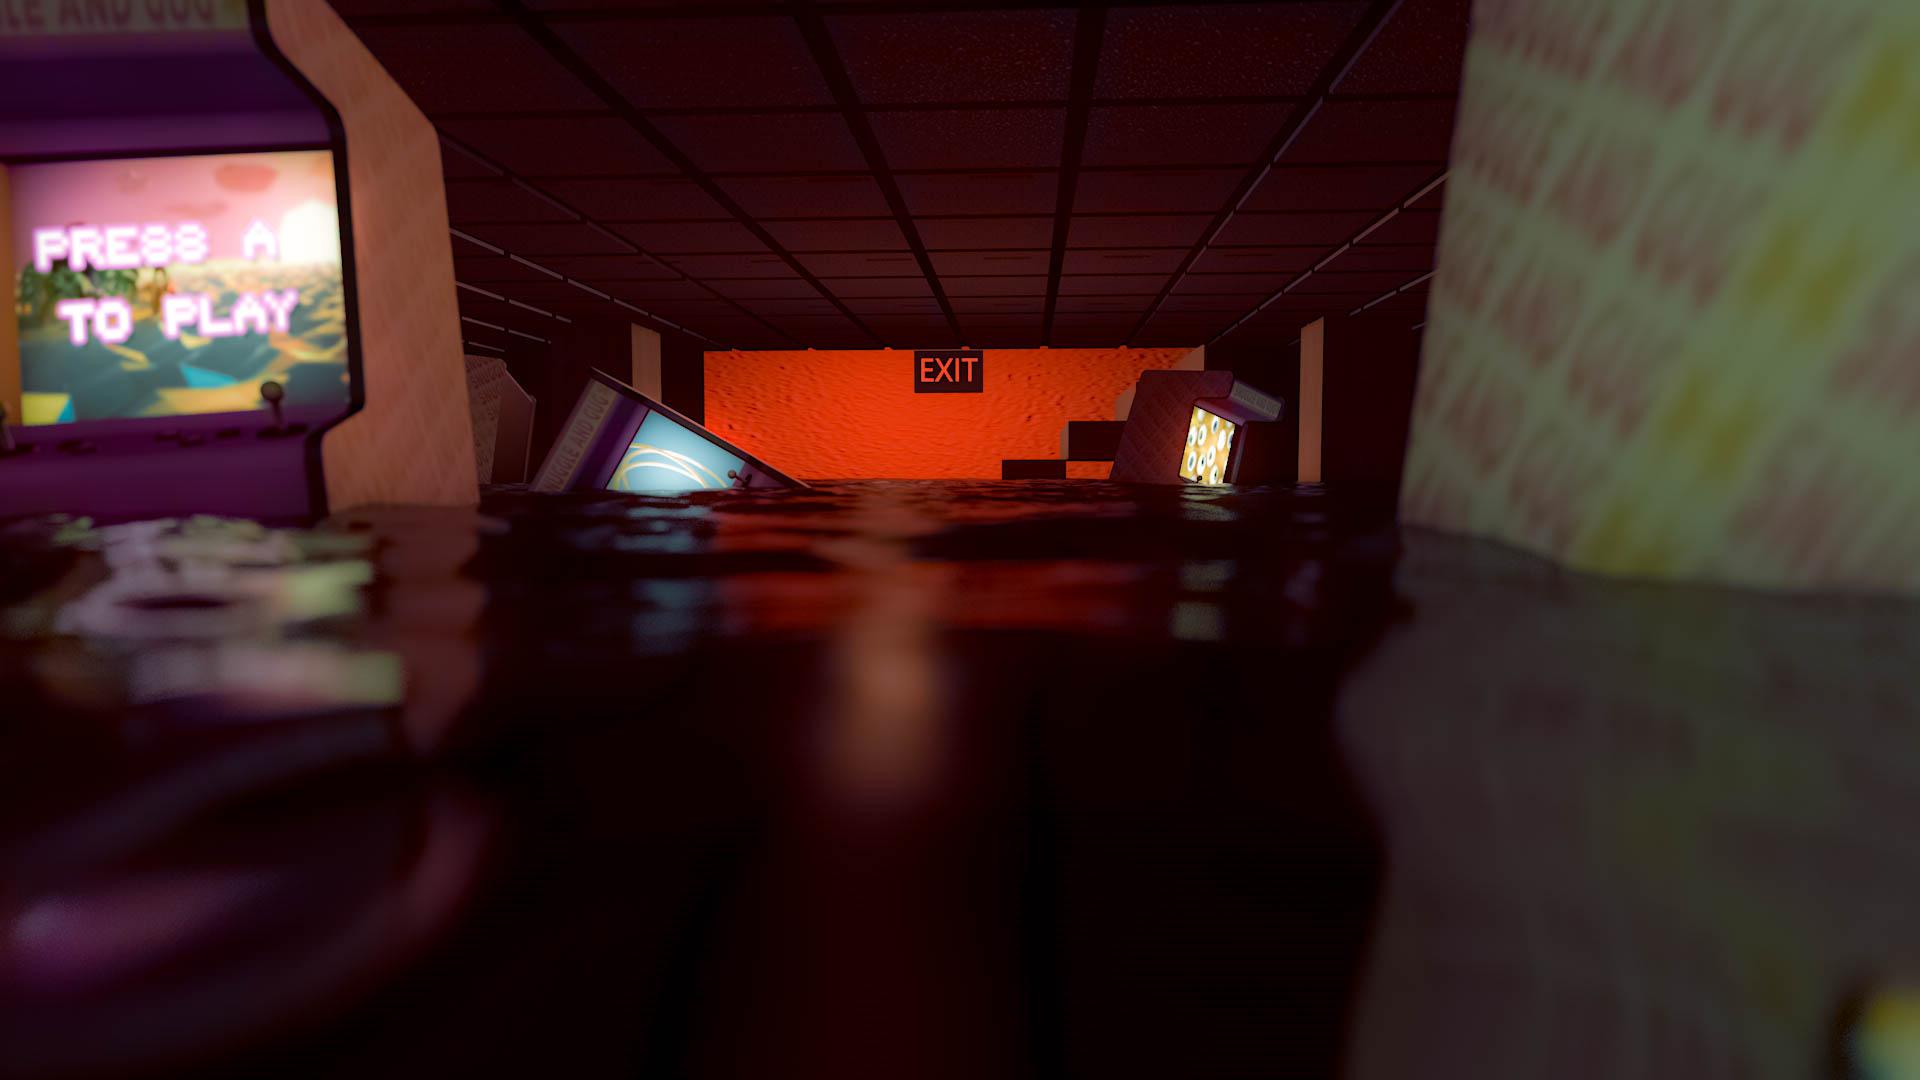 Scenes From My Dreams: Sunken Arcade